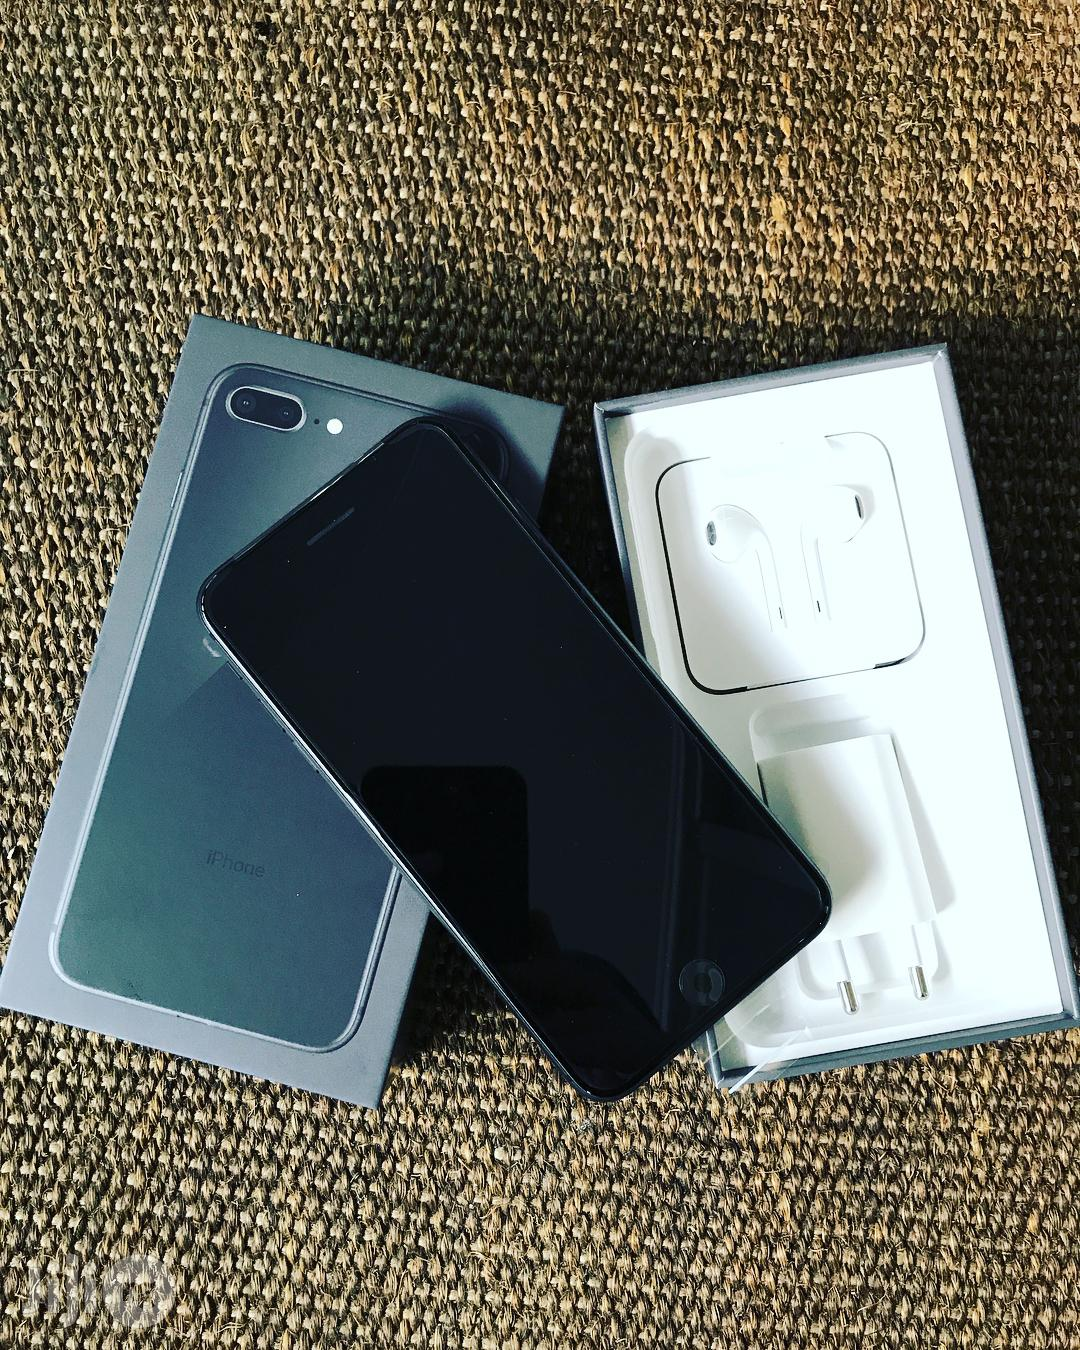 Apple iPhone 8 Plus 64 GB Gray | Mobile Phones for sale in Ikeja, Lagos State, Nigeria